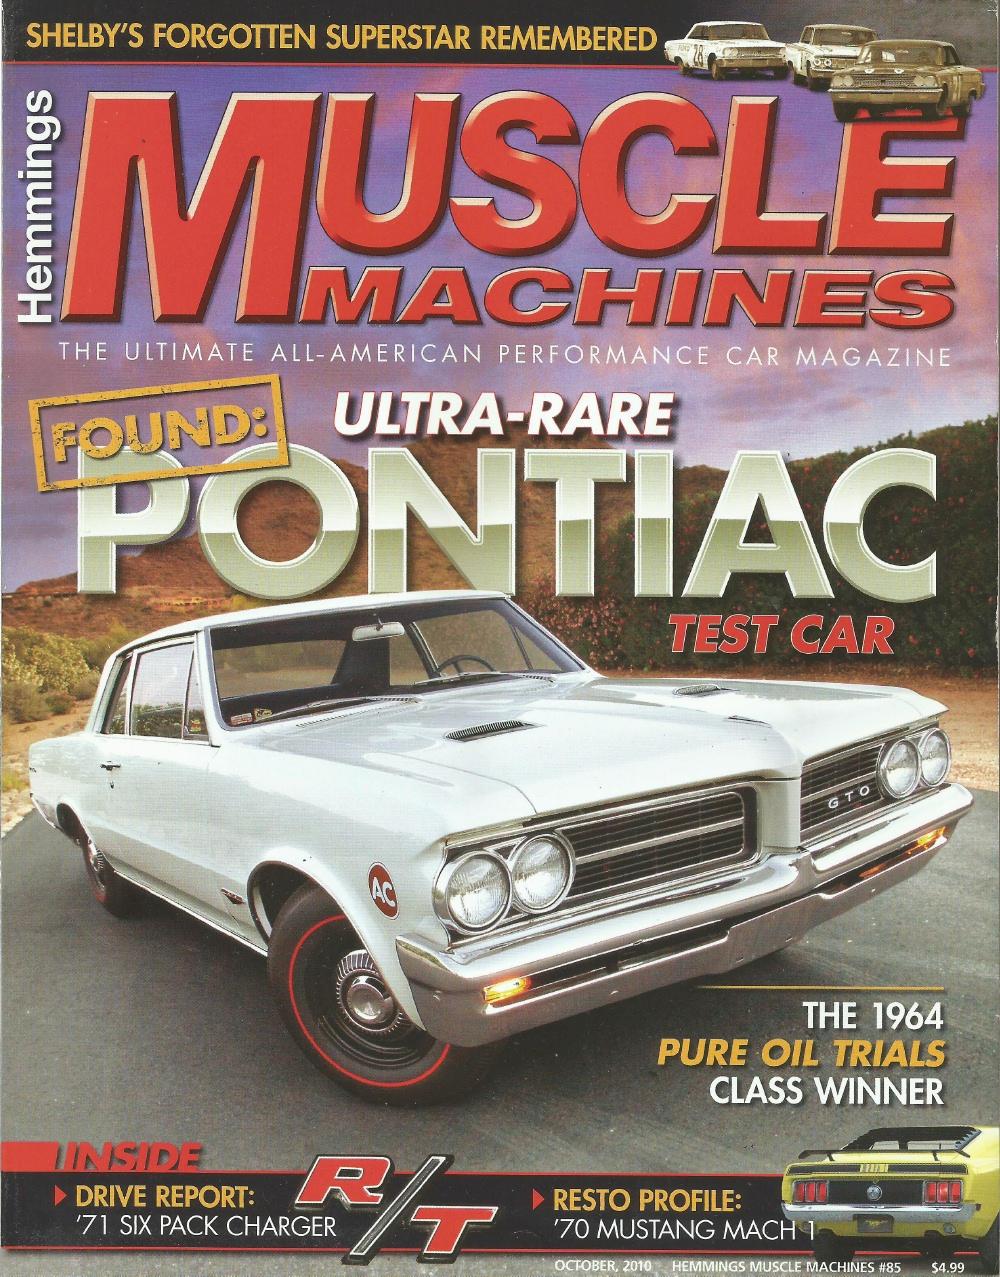 HEMMINGS MUSCLE MACHINES 2010 OCT - RARE GTO, 440-6, 427 L72, AMC -  2010-2019 - JIM'S MEGA MAGAZINES